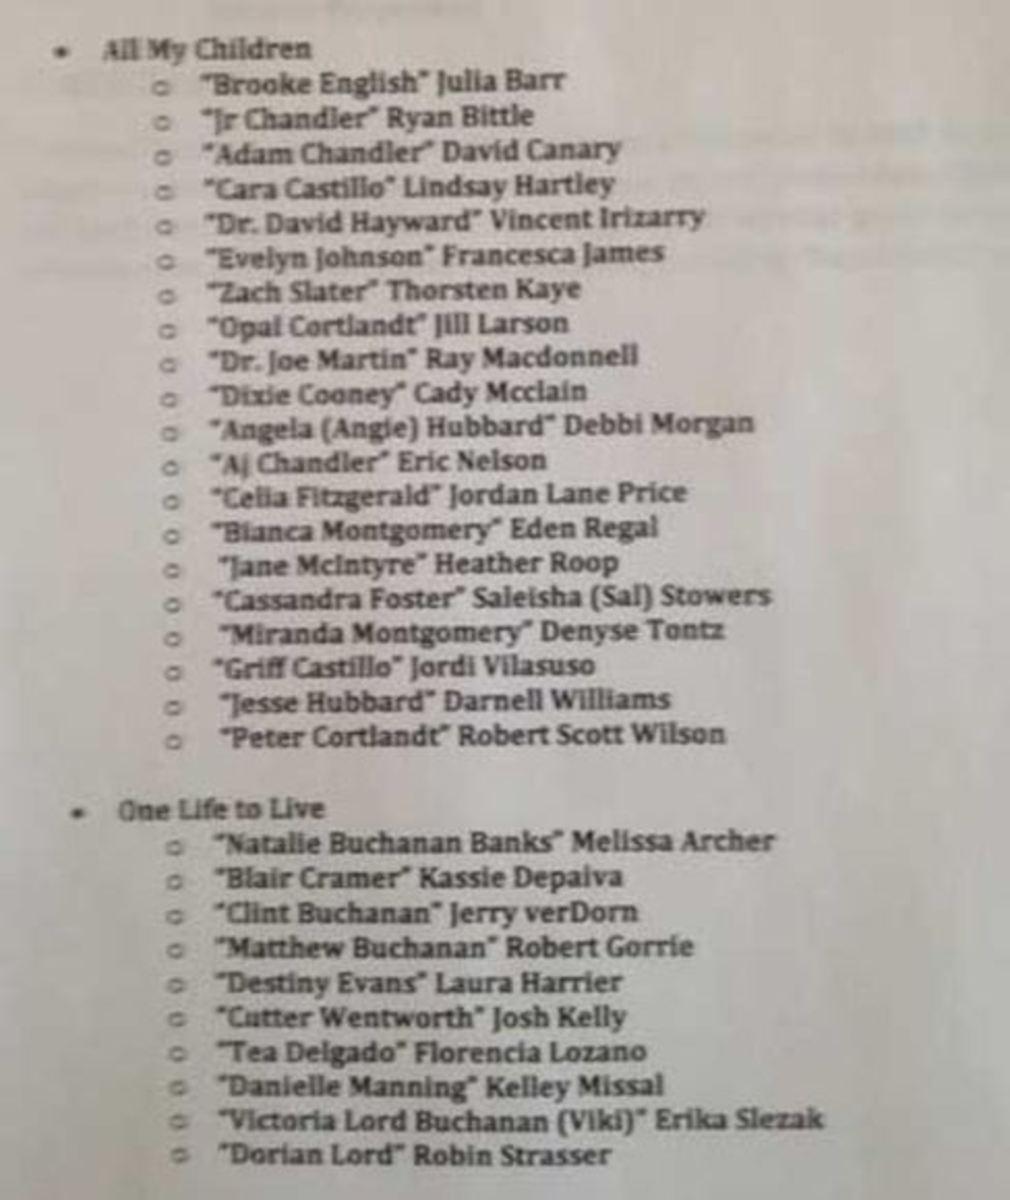 AMC_cast_list_1